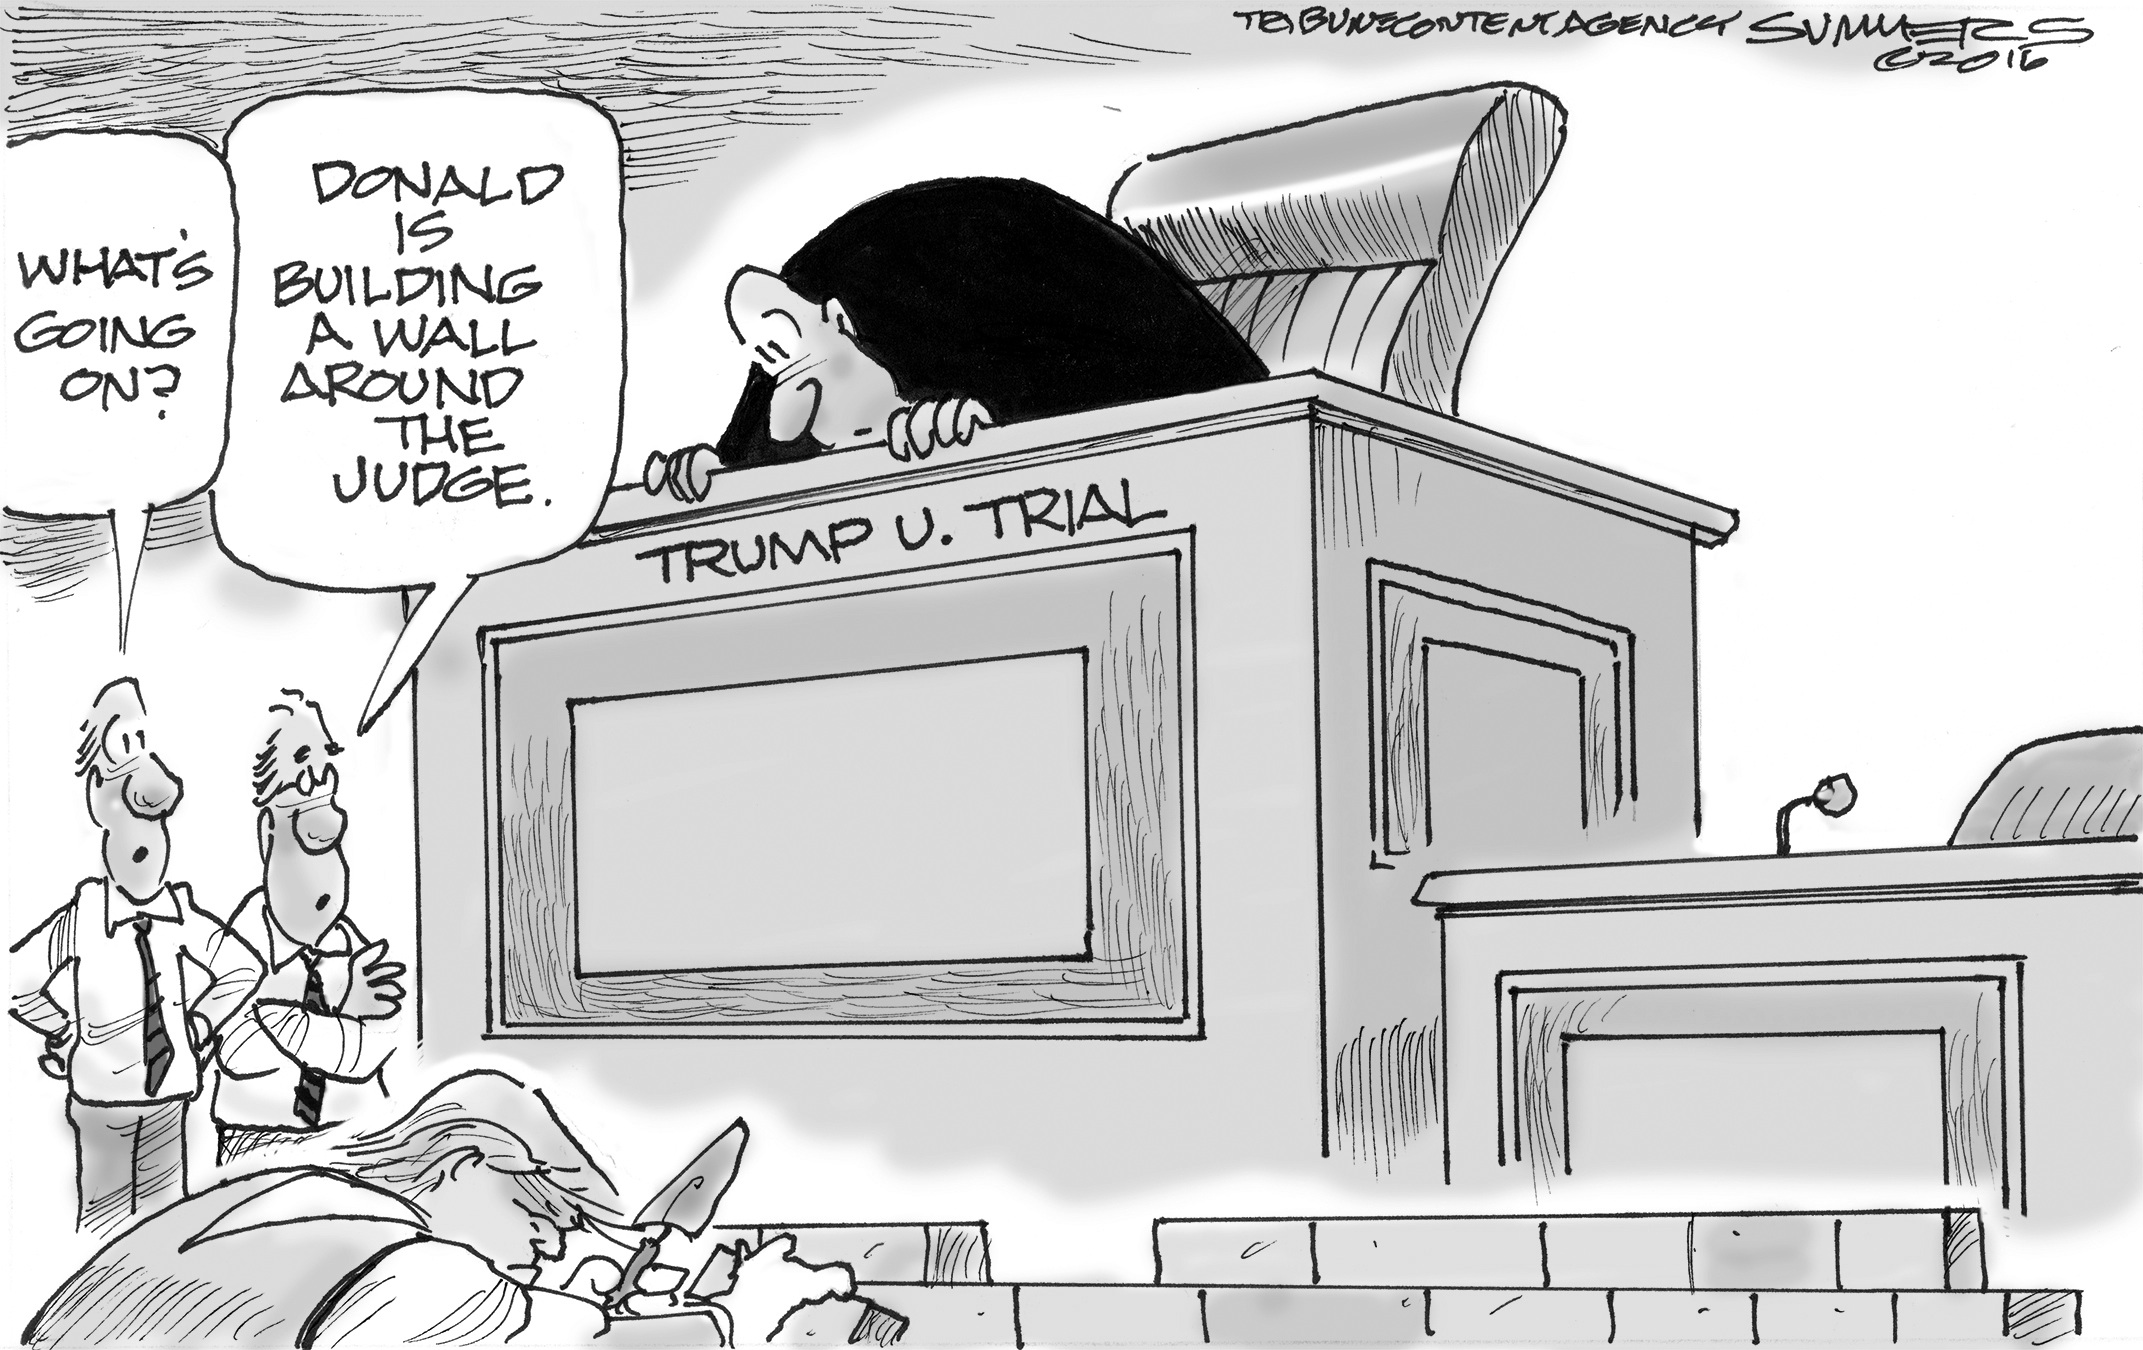 June 11: Trump Wall